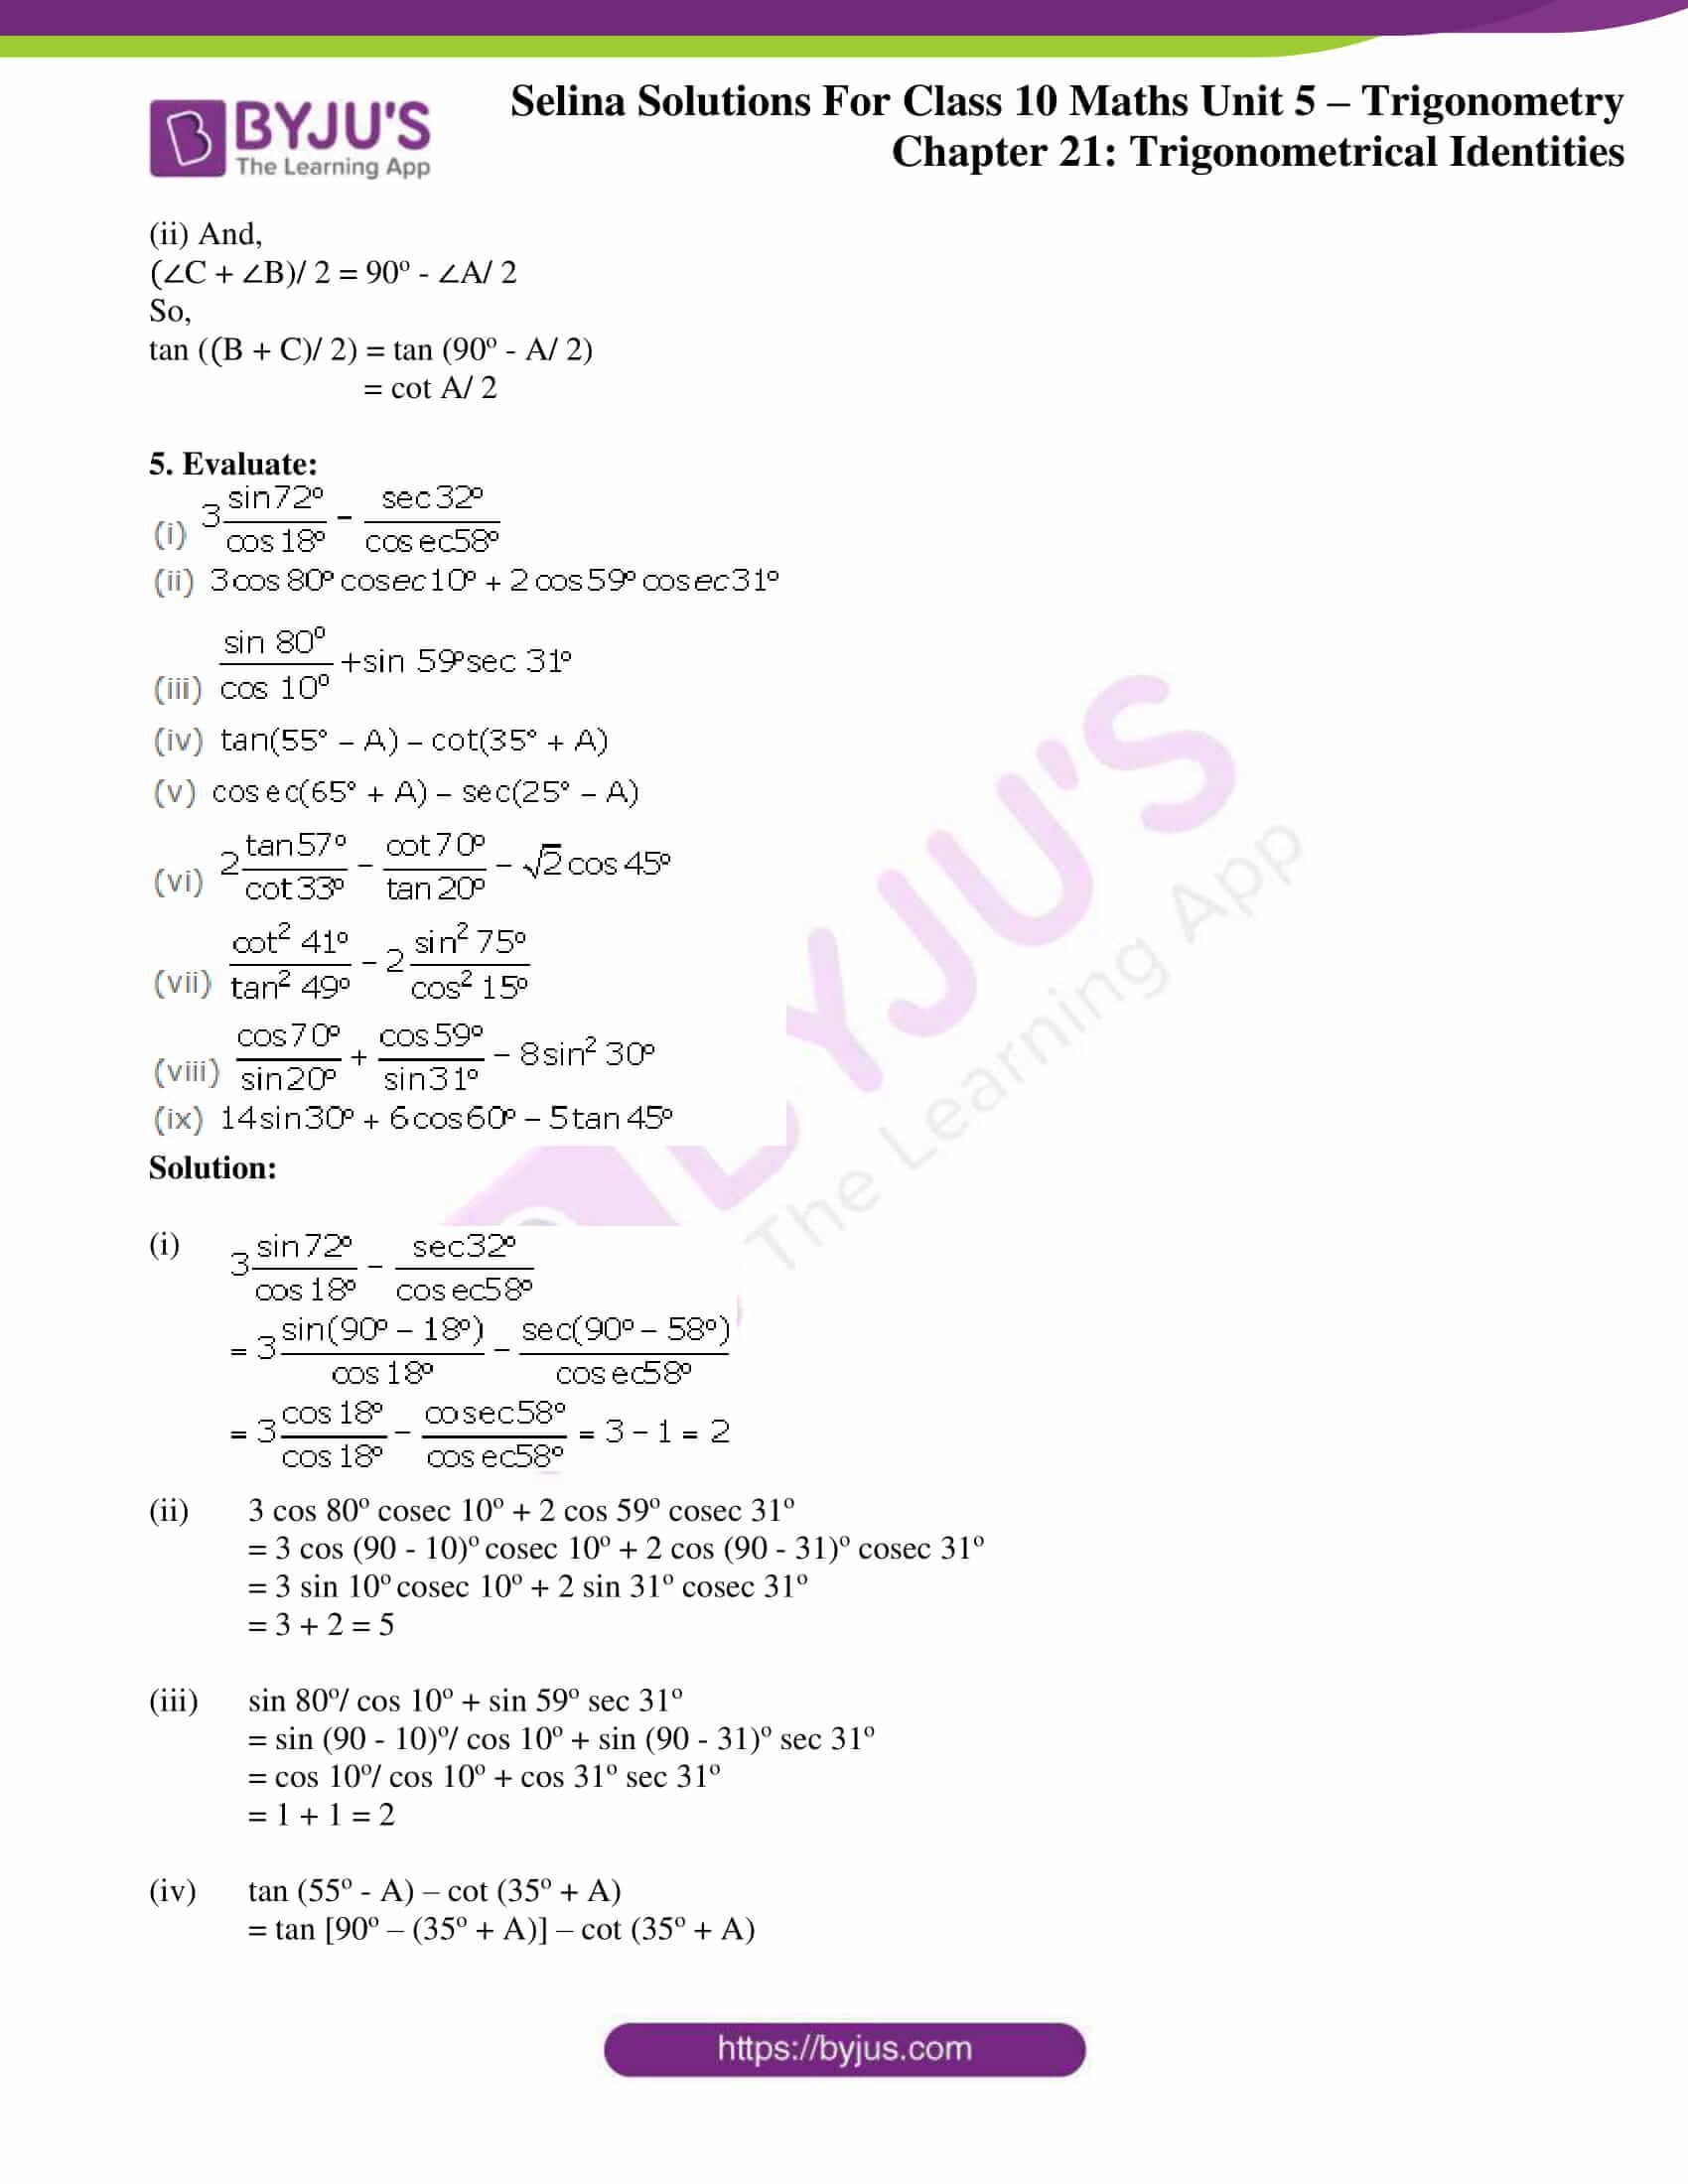 selina-sol-maths-class-10-ch-21-ex-c-3